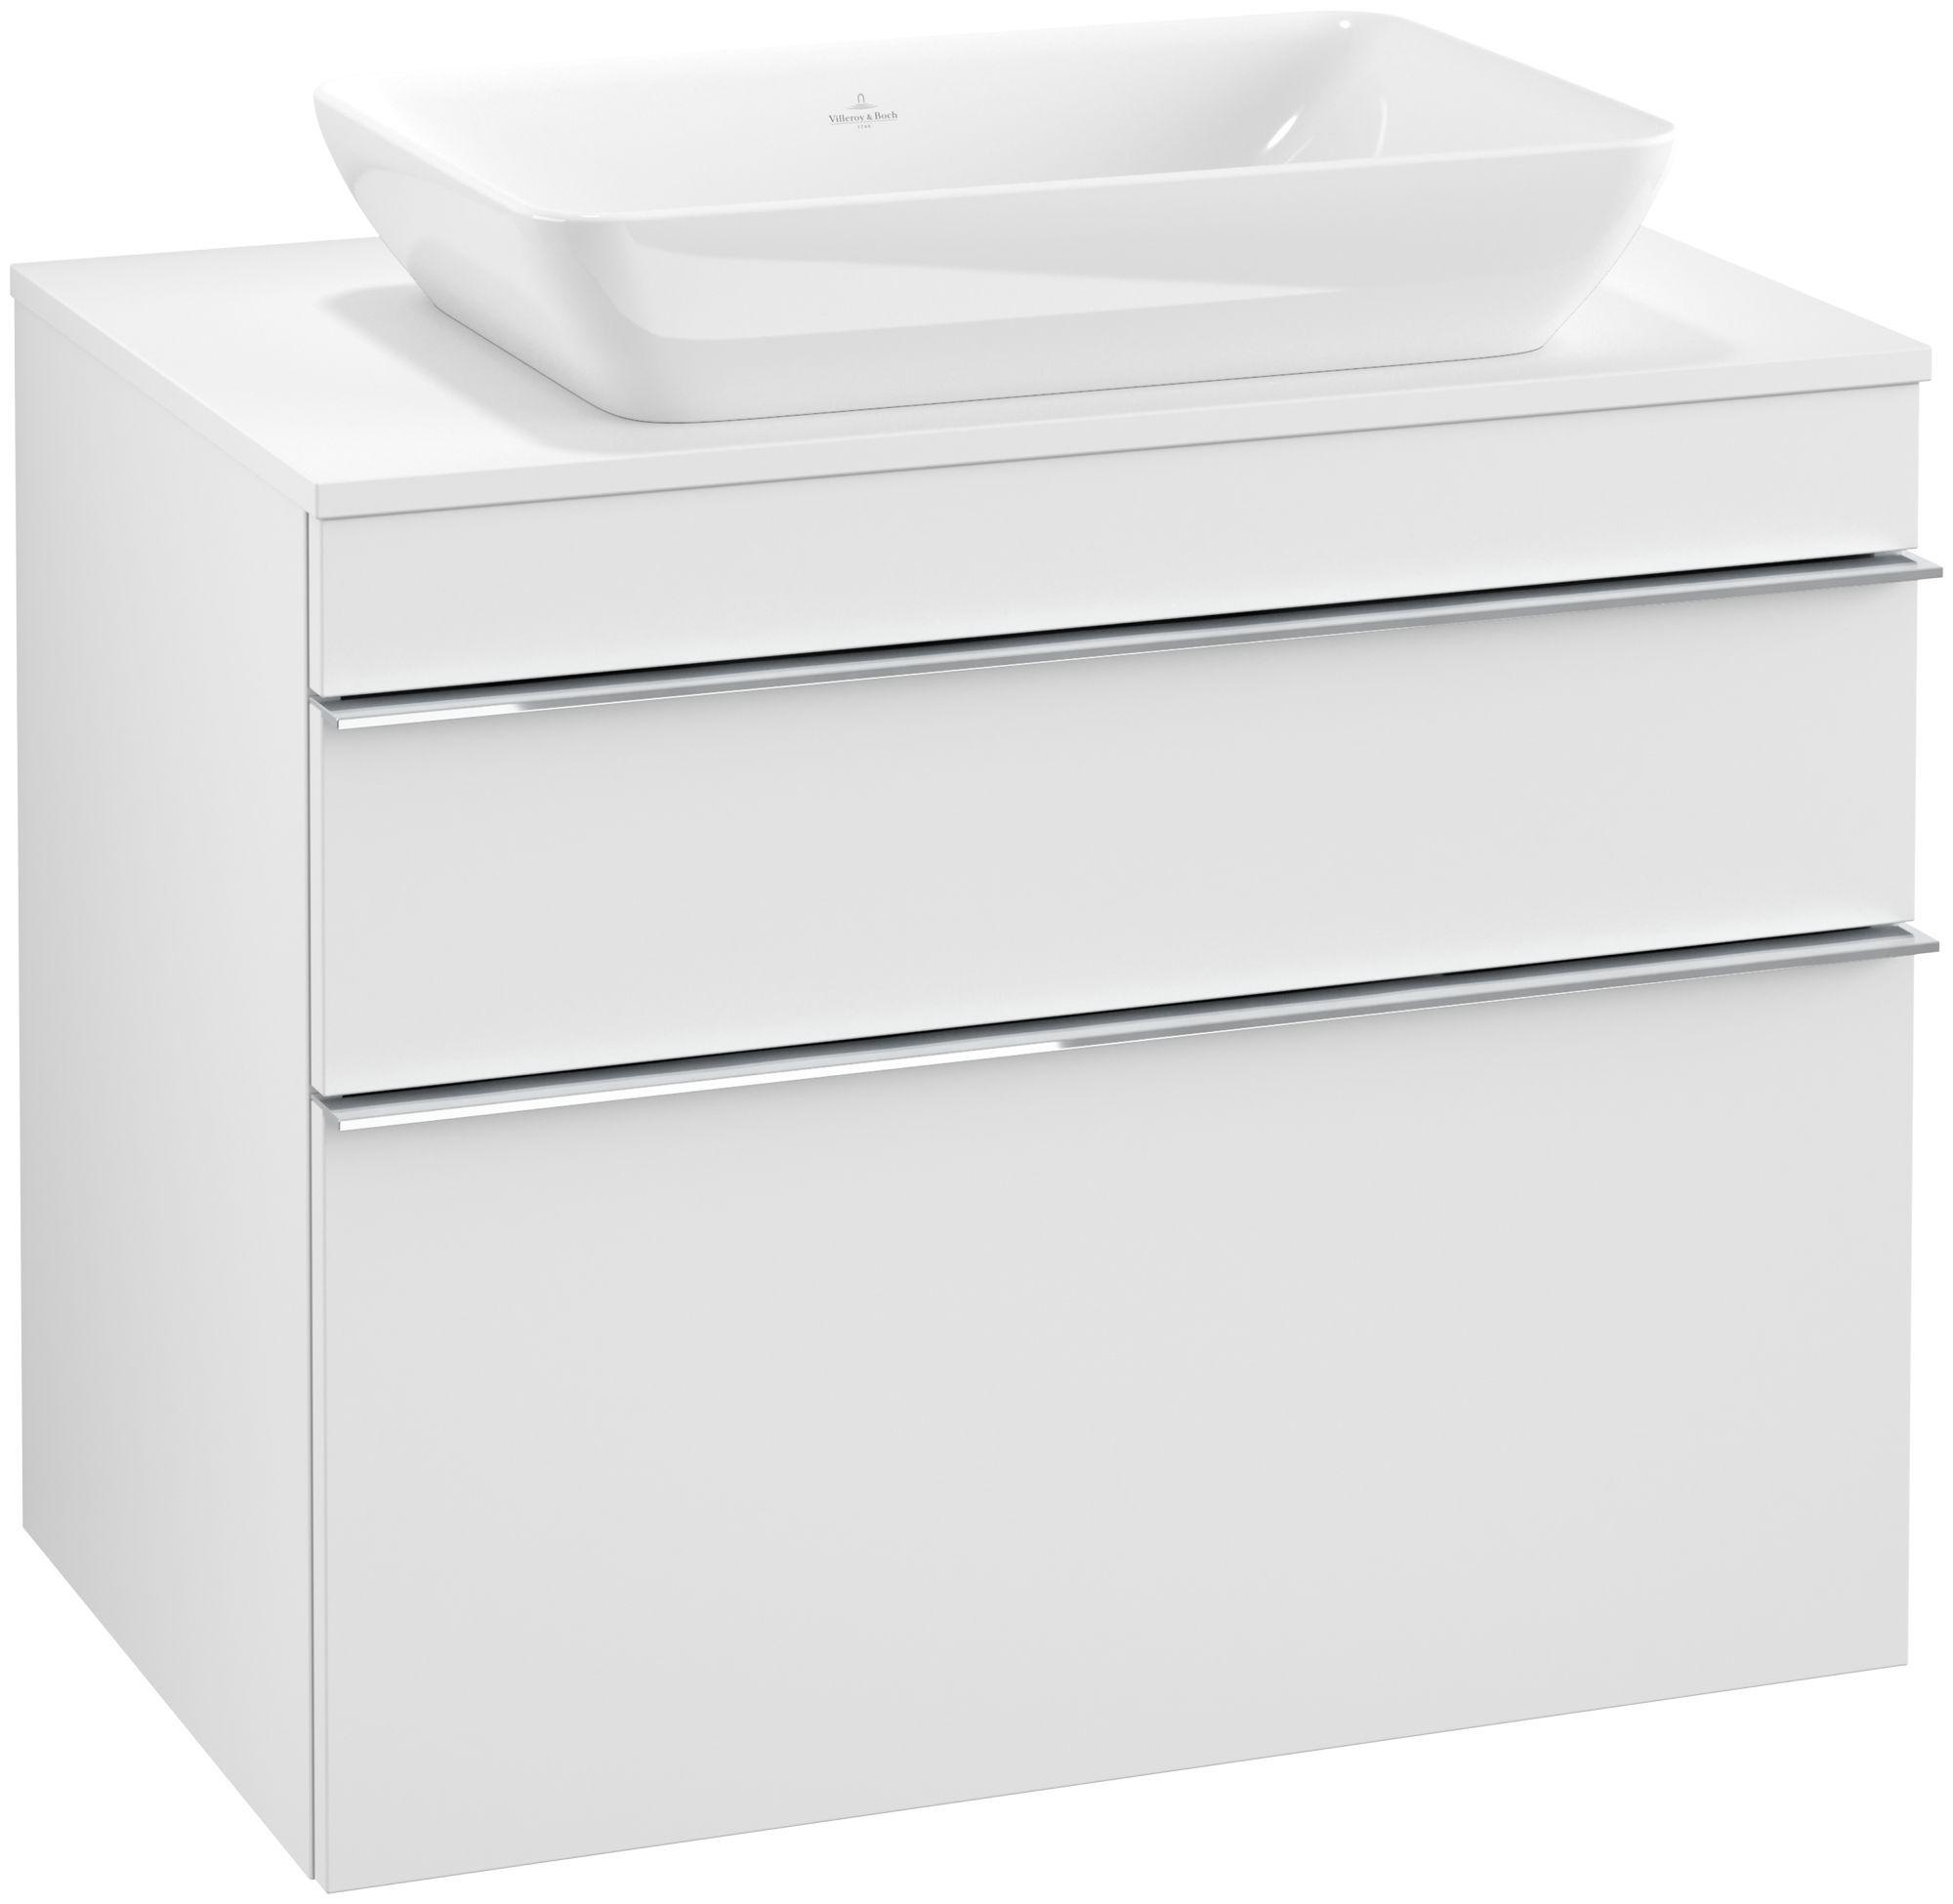 Villeroy & Boch Venticello Waschtischunterschrank 2 Auszüge B:757xT:502xH:606mm weiß matt Griffe chrom A94001MS